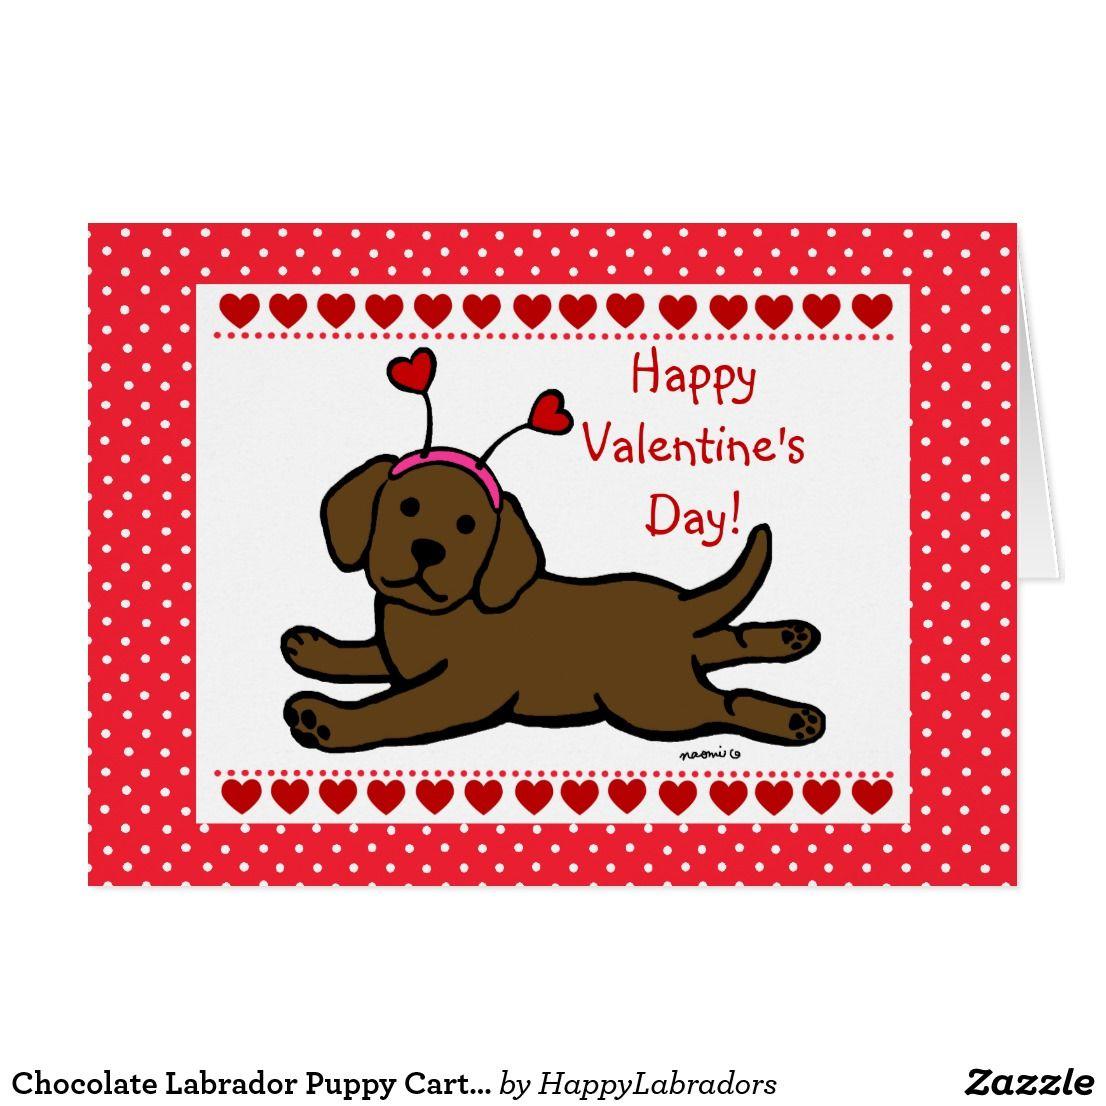 Chocolate Labrador Puppy Cartoon Valentine Holiday Card Chocolate